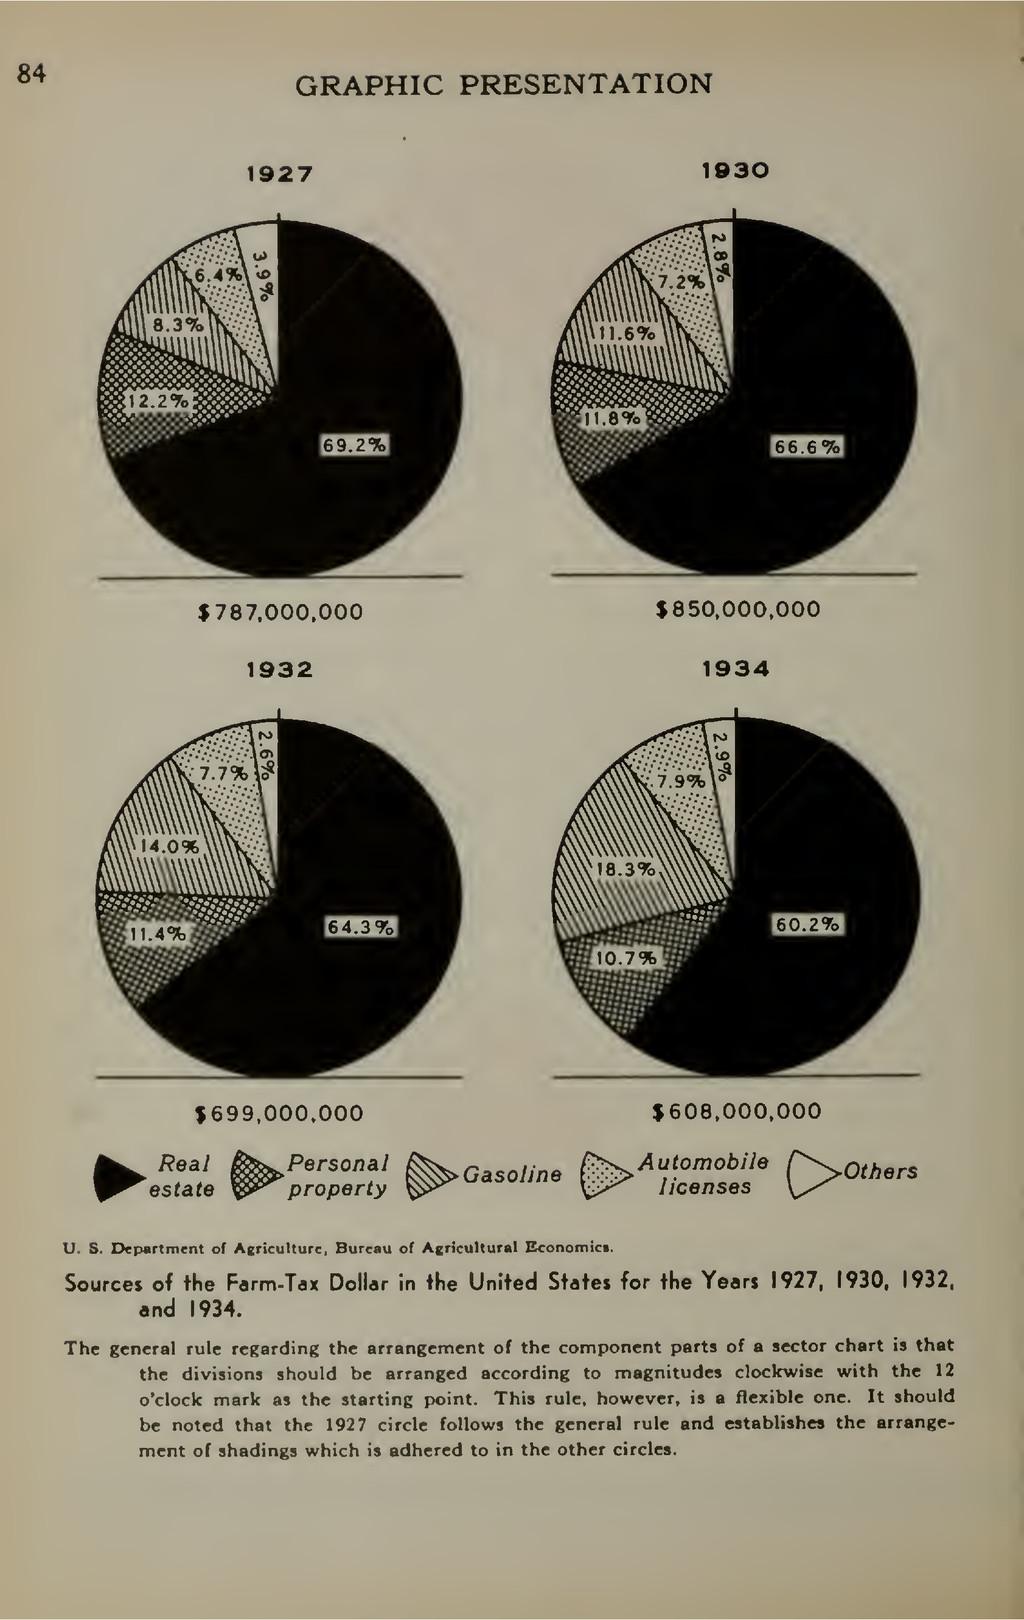 84 GRAPHIC PRESENTATION 1927 1930 $787,000,000 ...